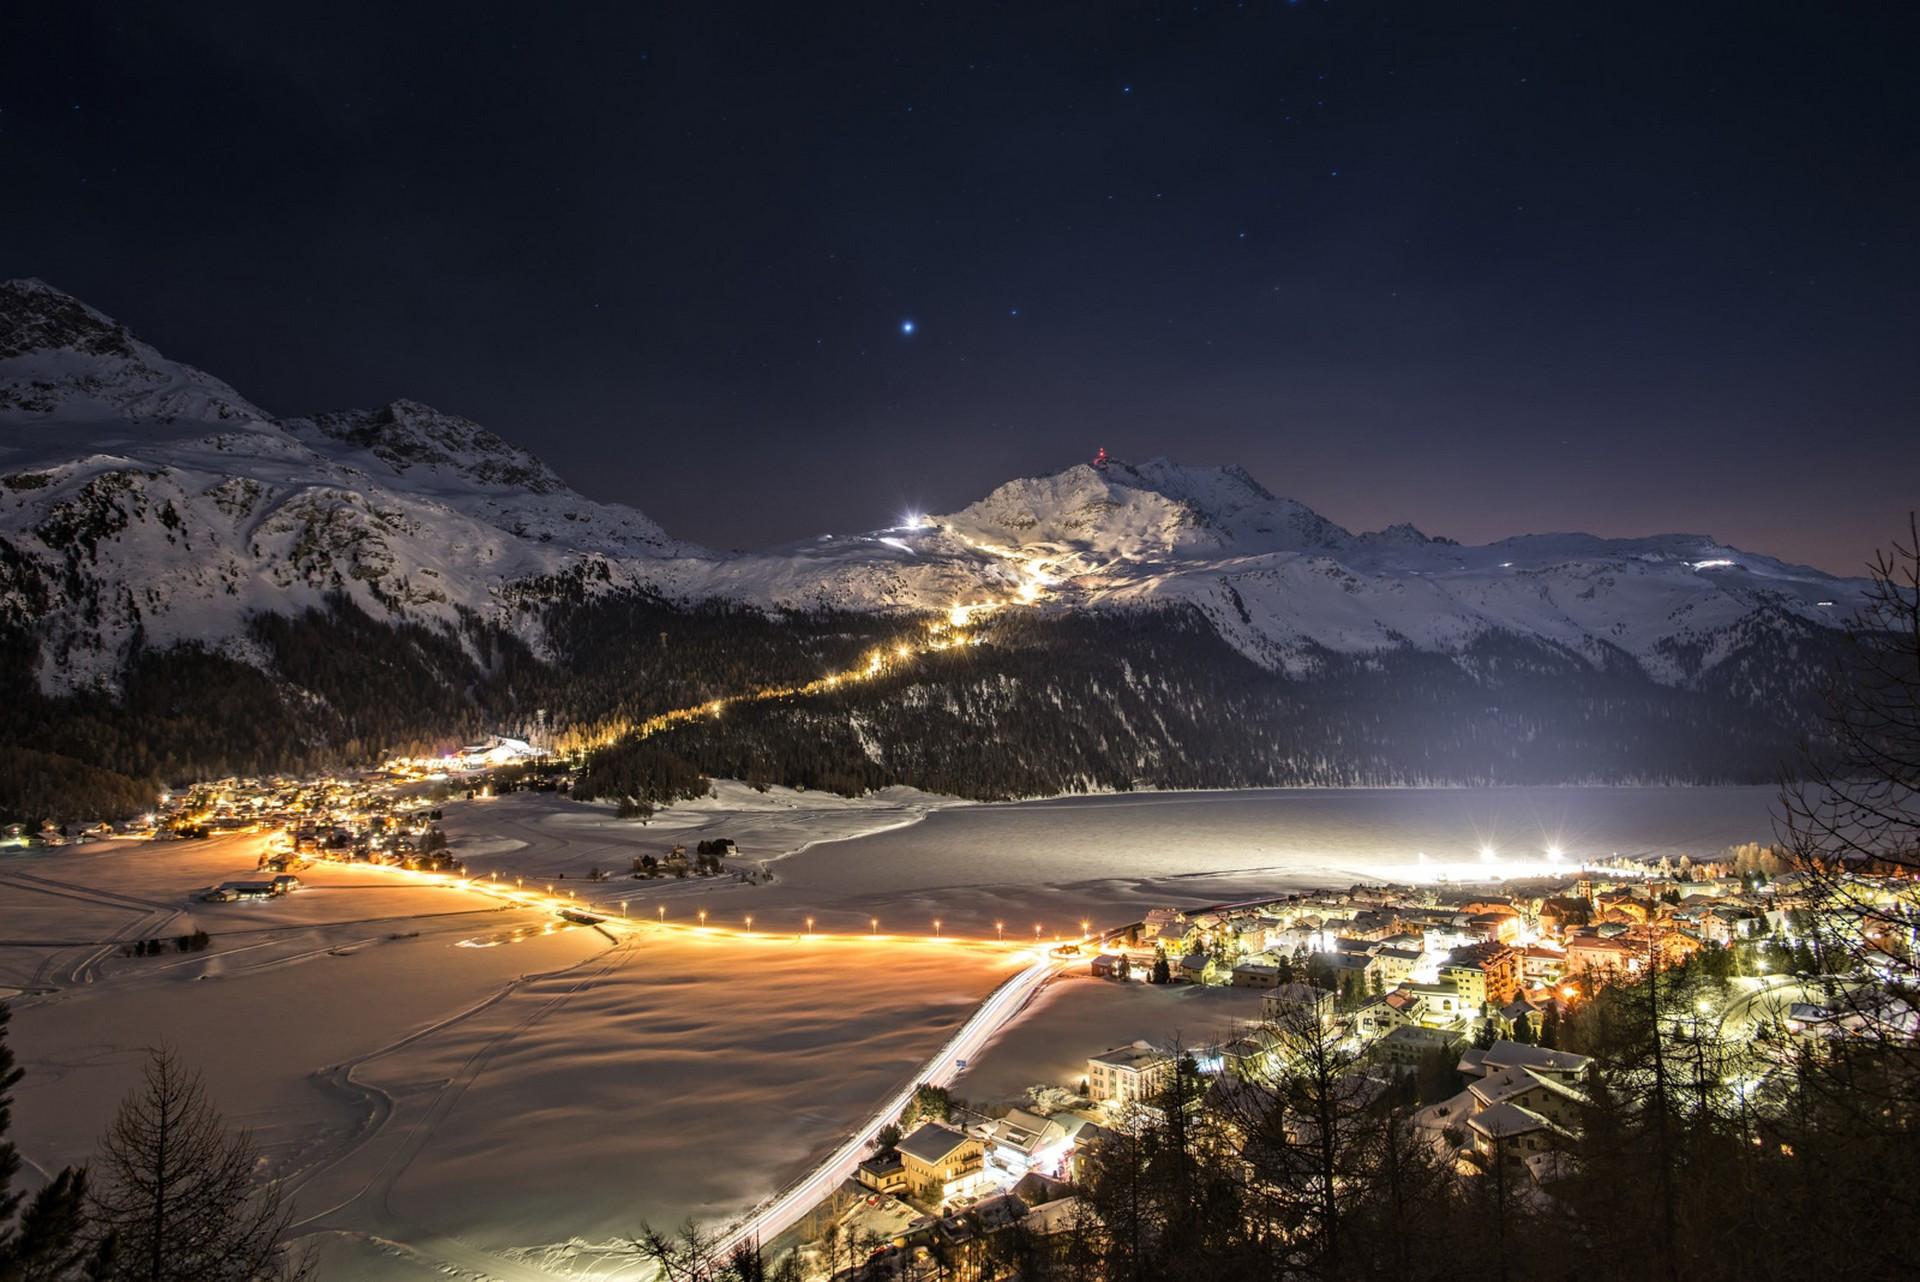 Glühweinwanderung - Celerina/St. Moritz